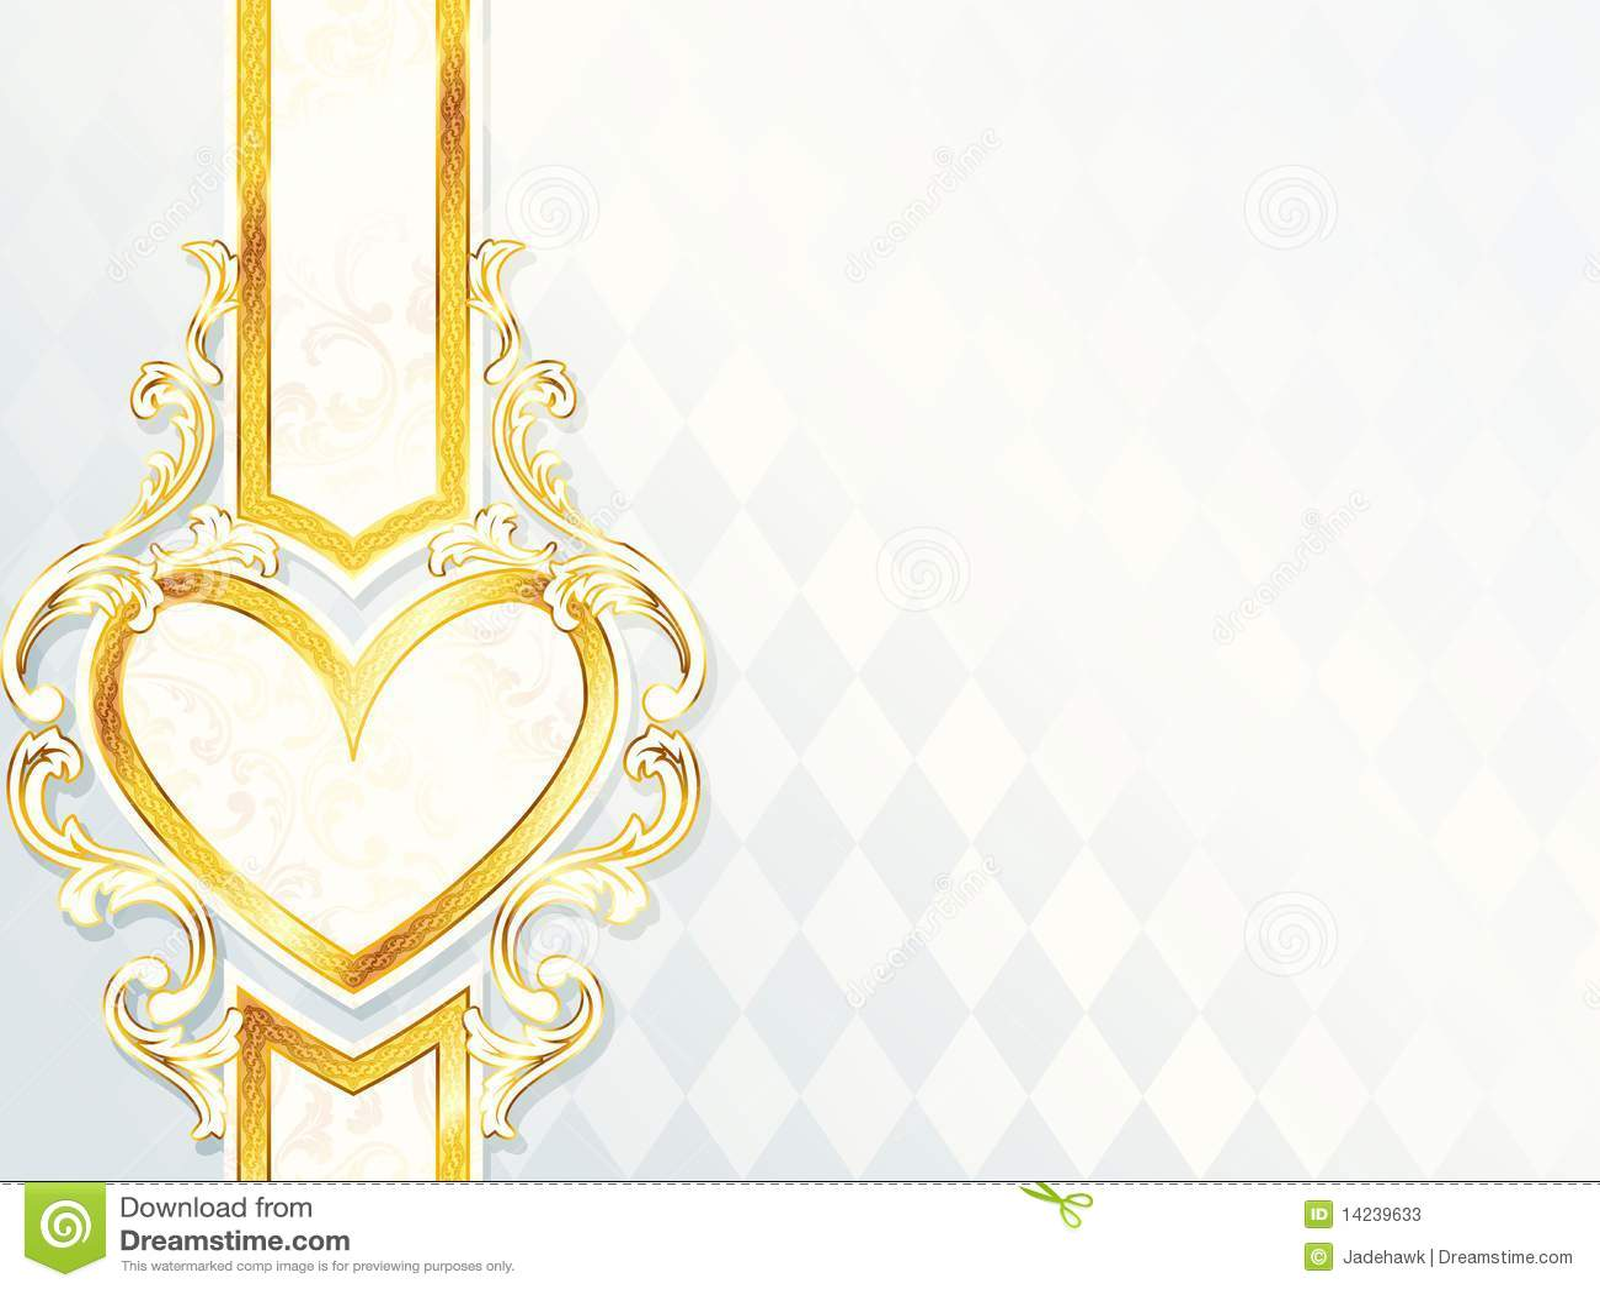 Horizontal Rococo Wedding Banner With Heart Emblem Stock Photos ...